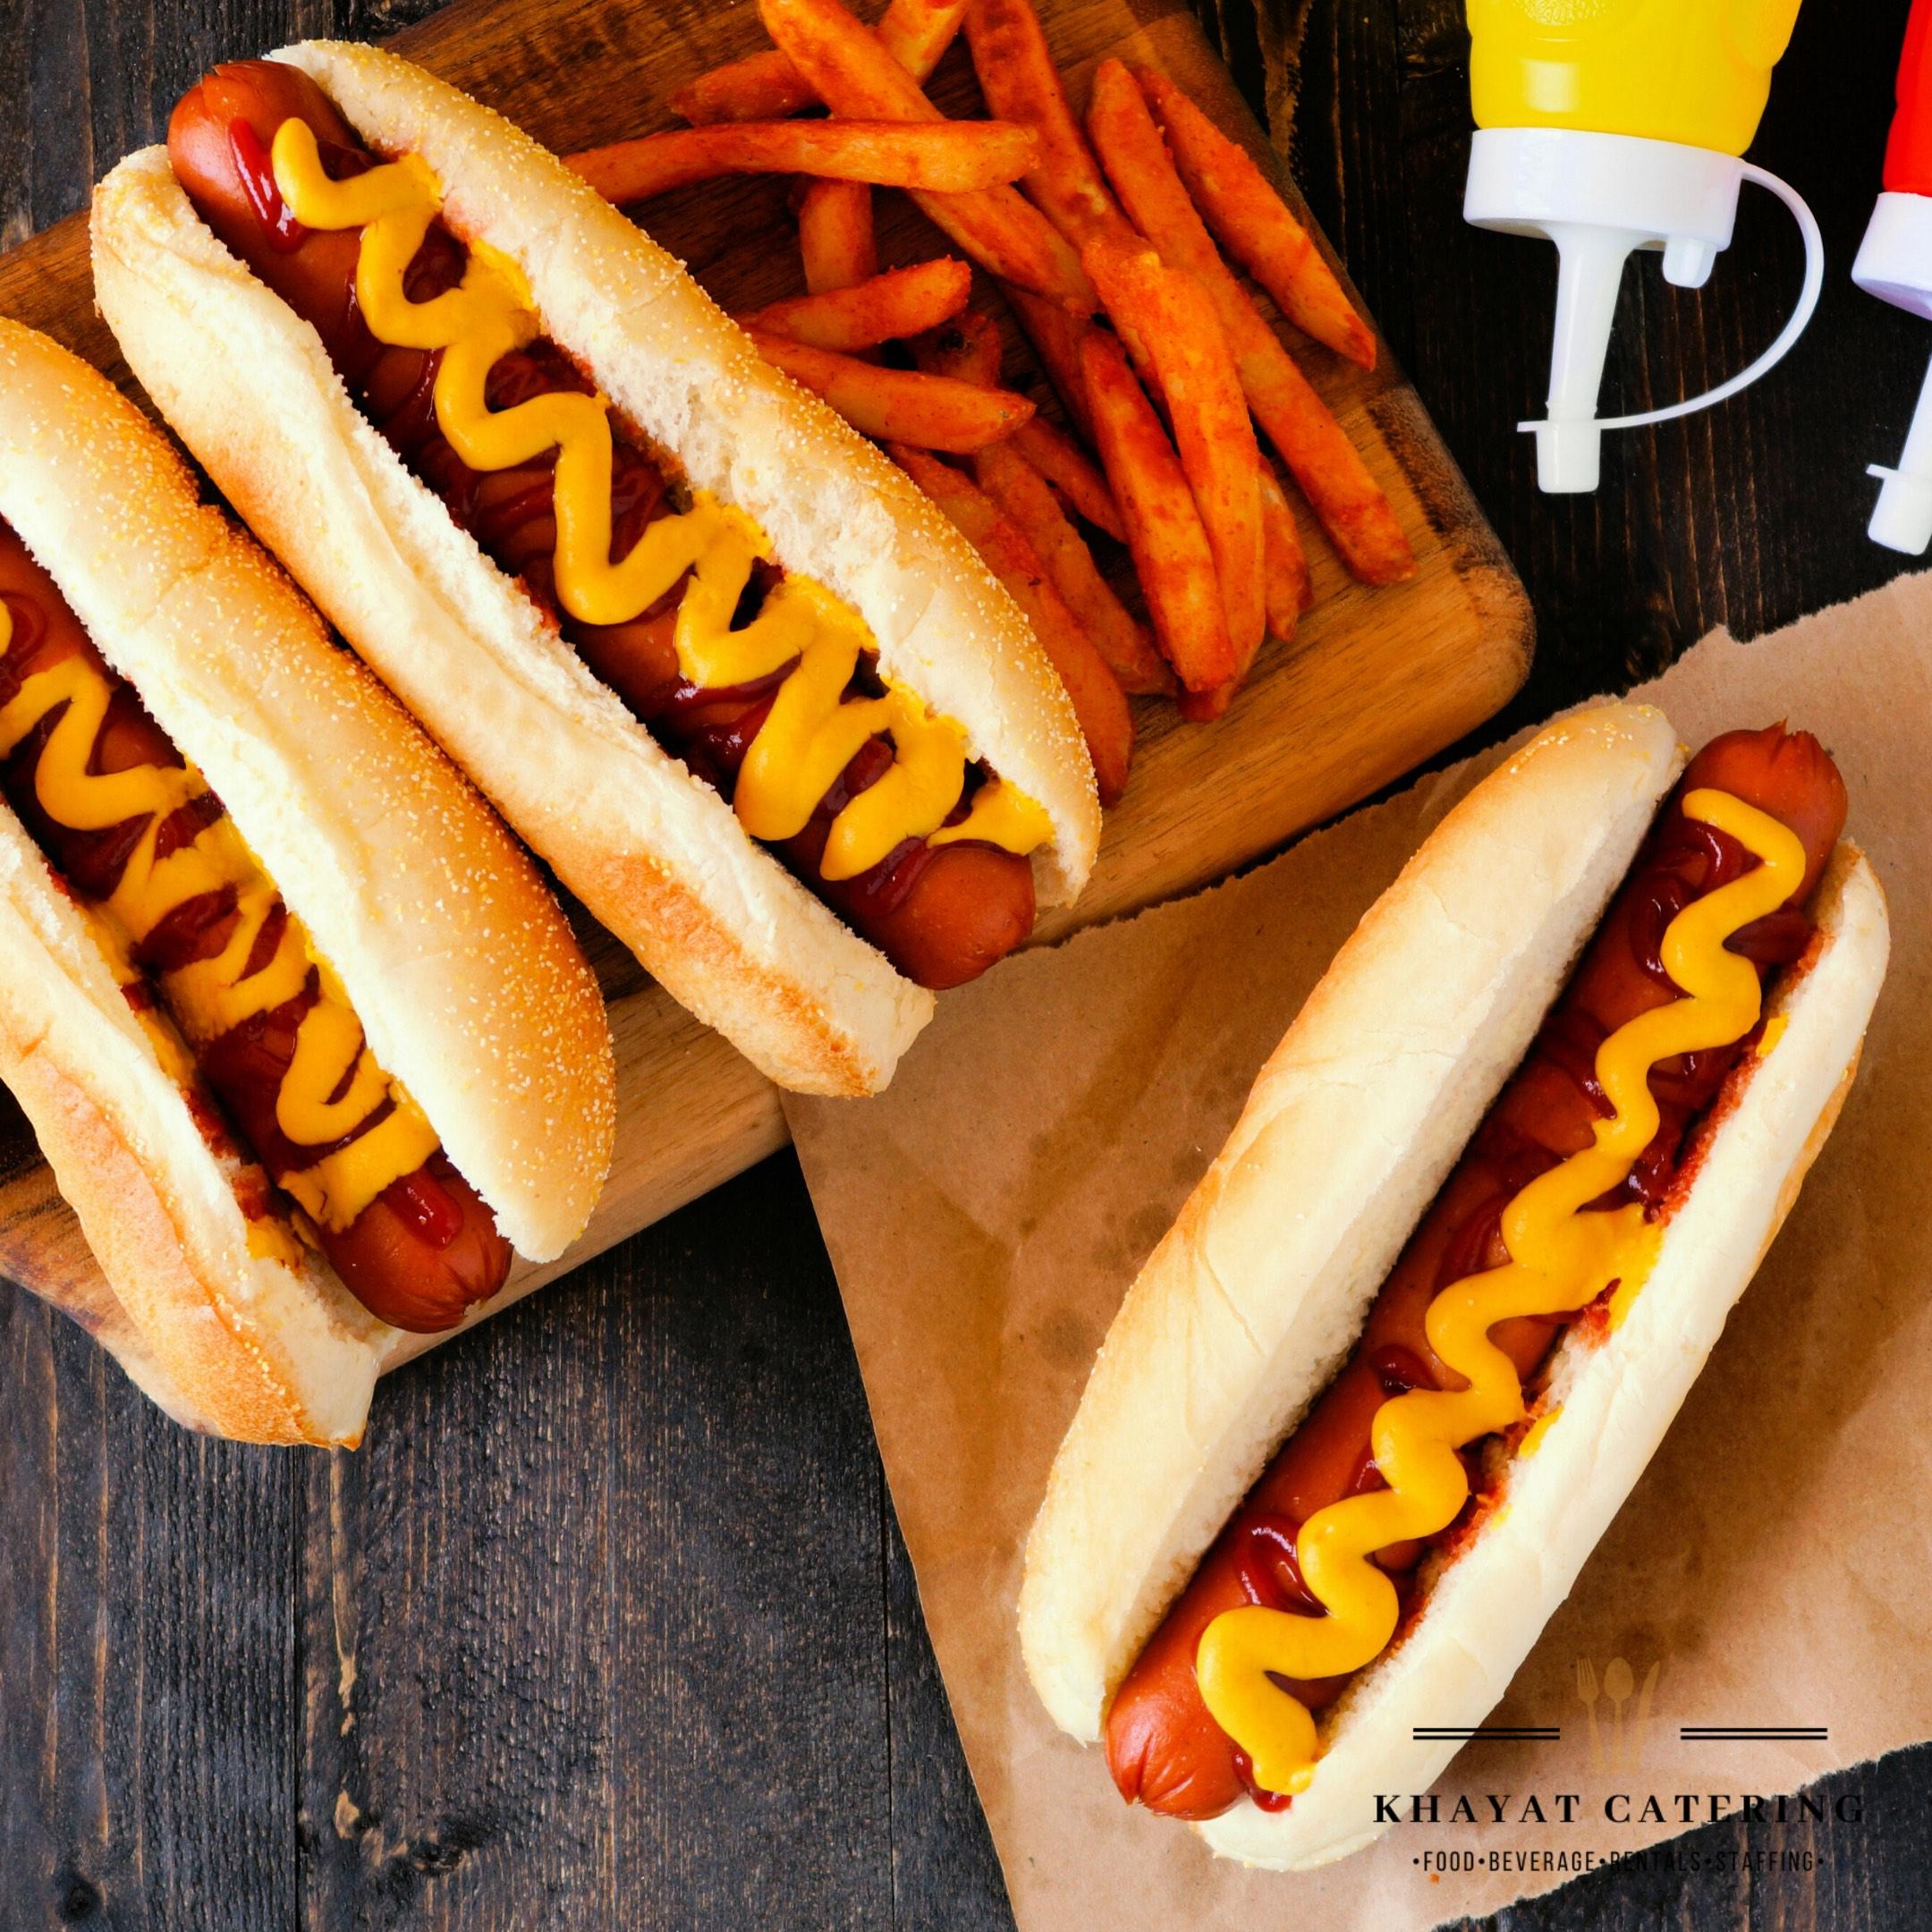 Khayat Catering hot dogs